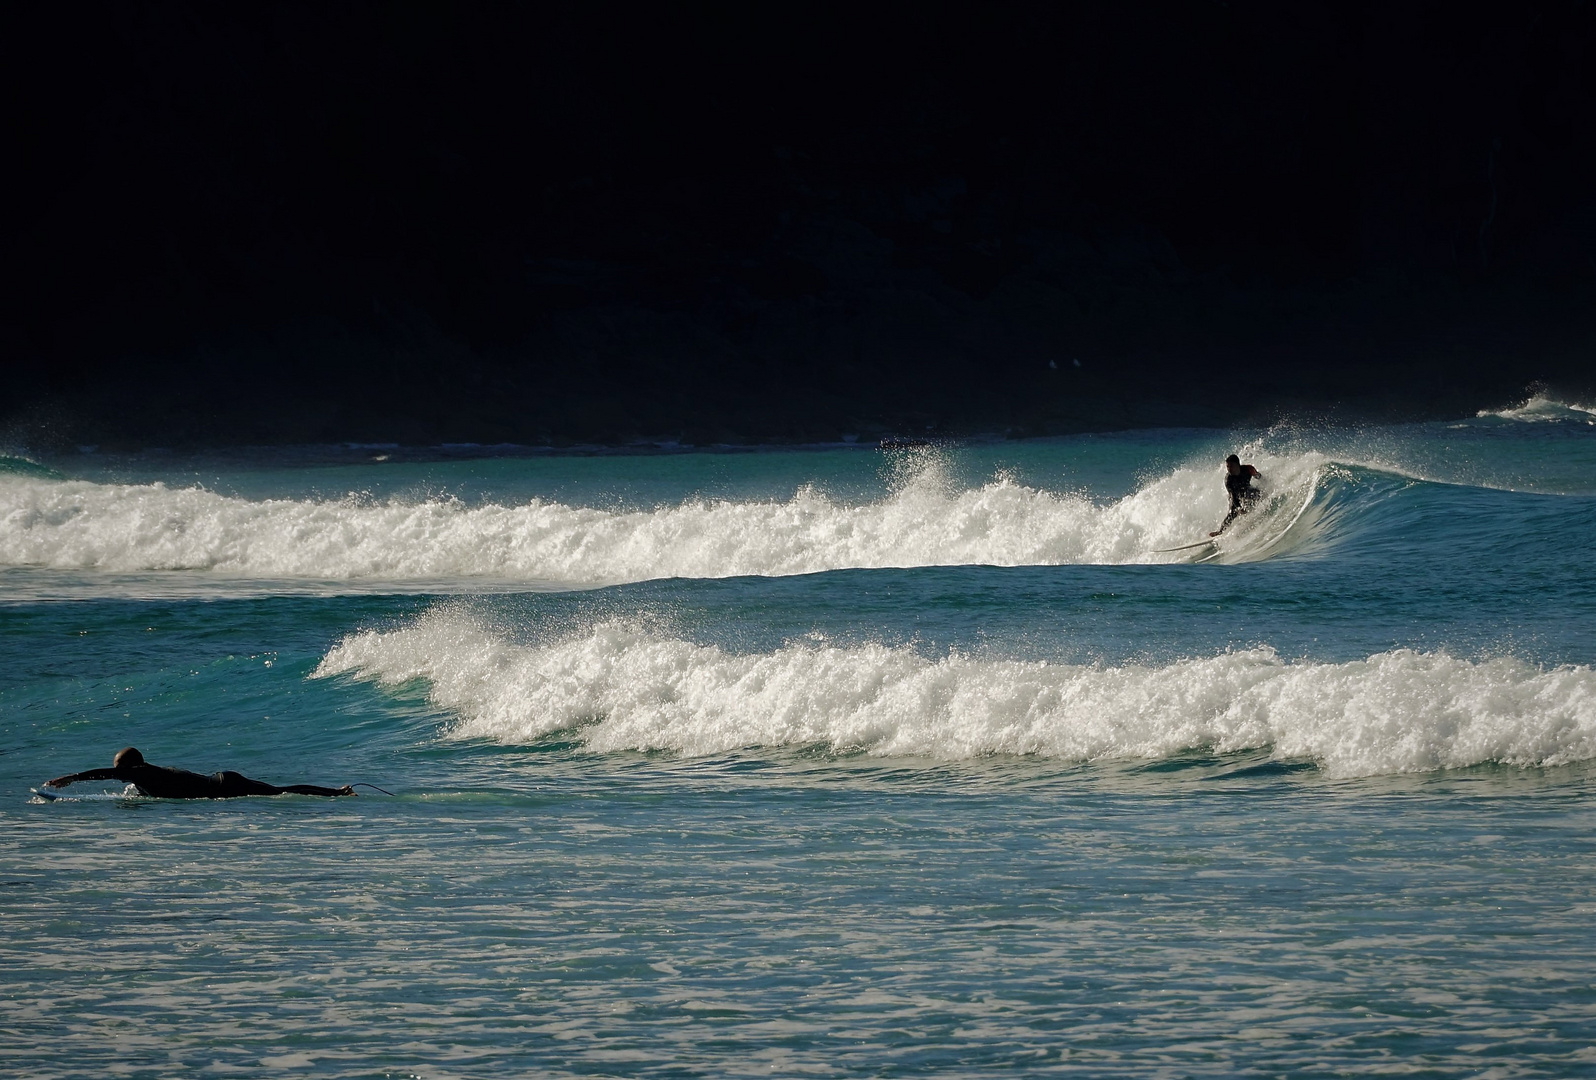 castelejo 9 - on the wave!